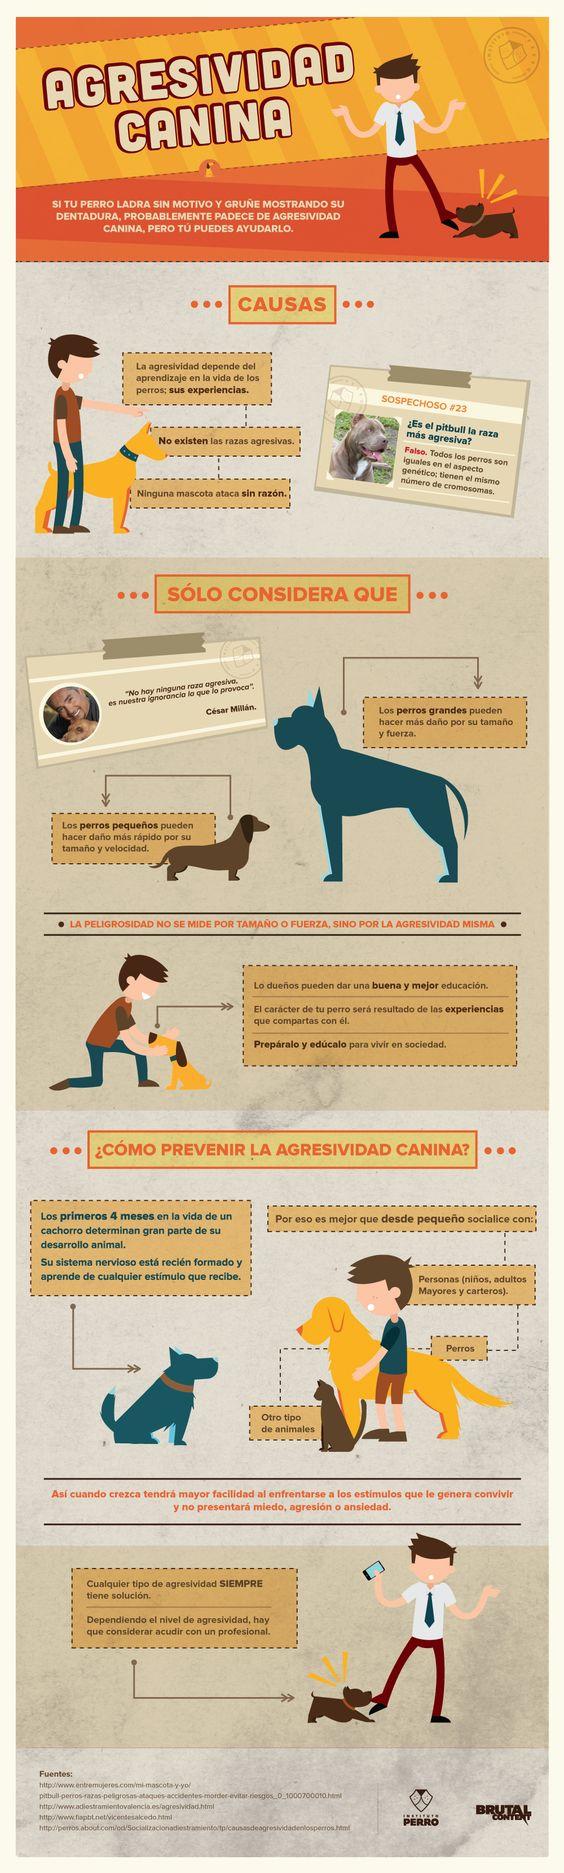 agresividad canina.jpg